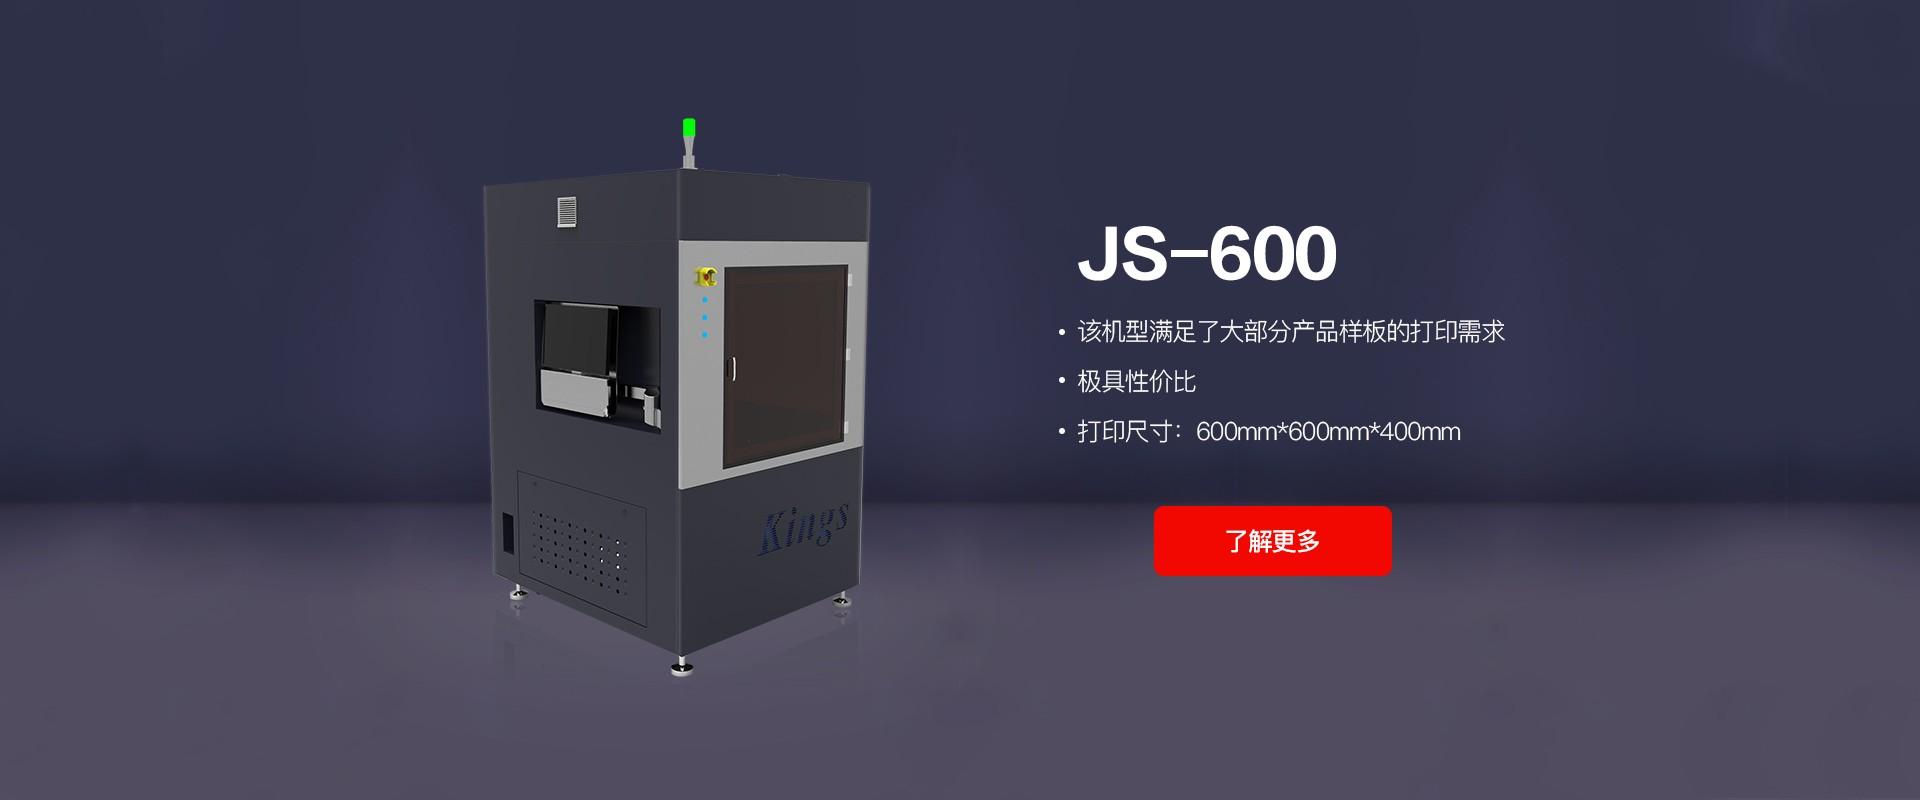 JS-600